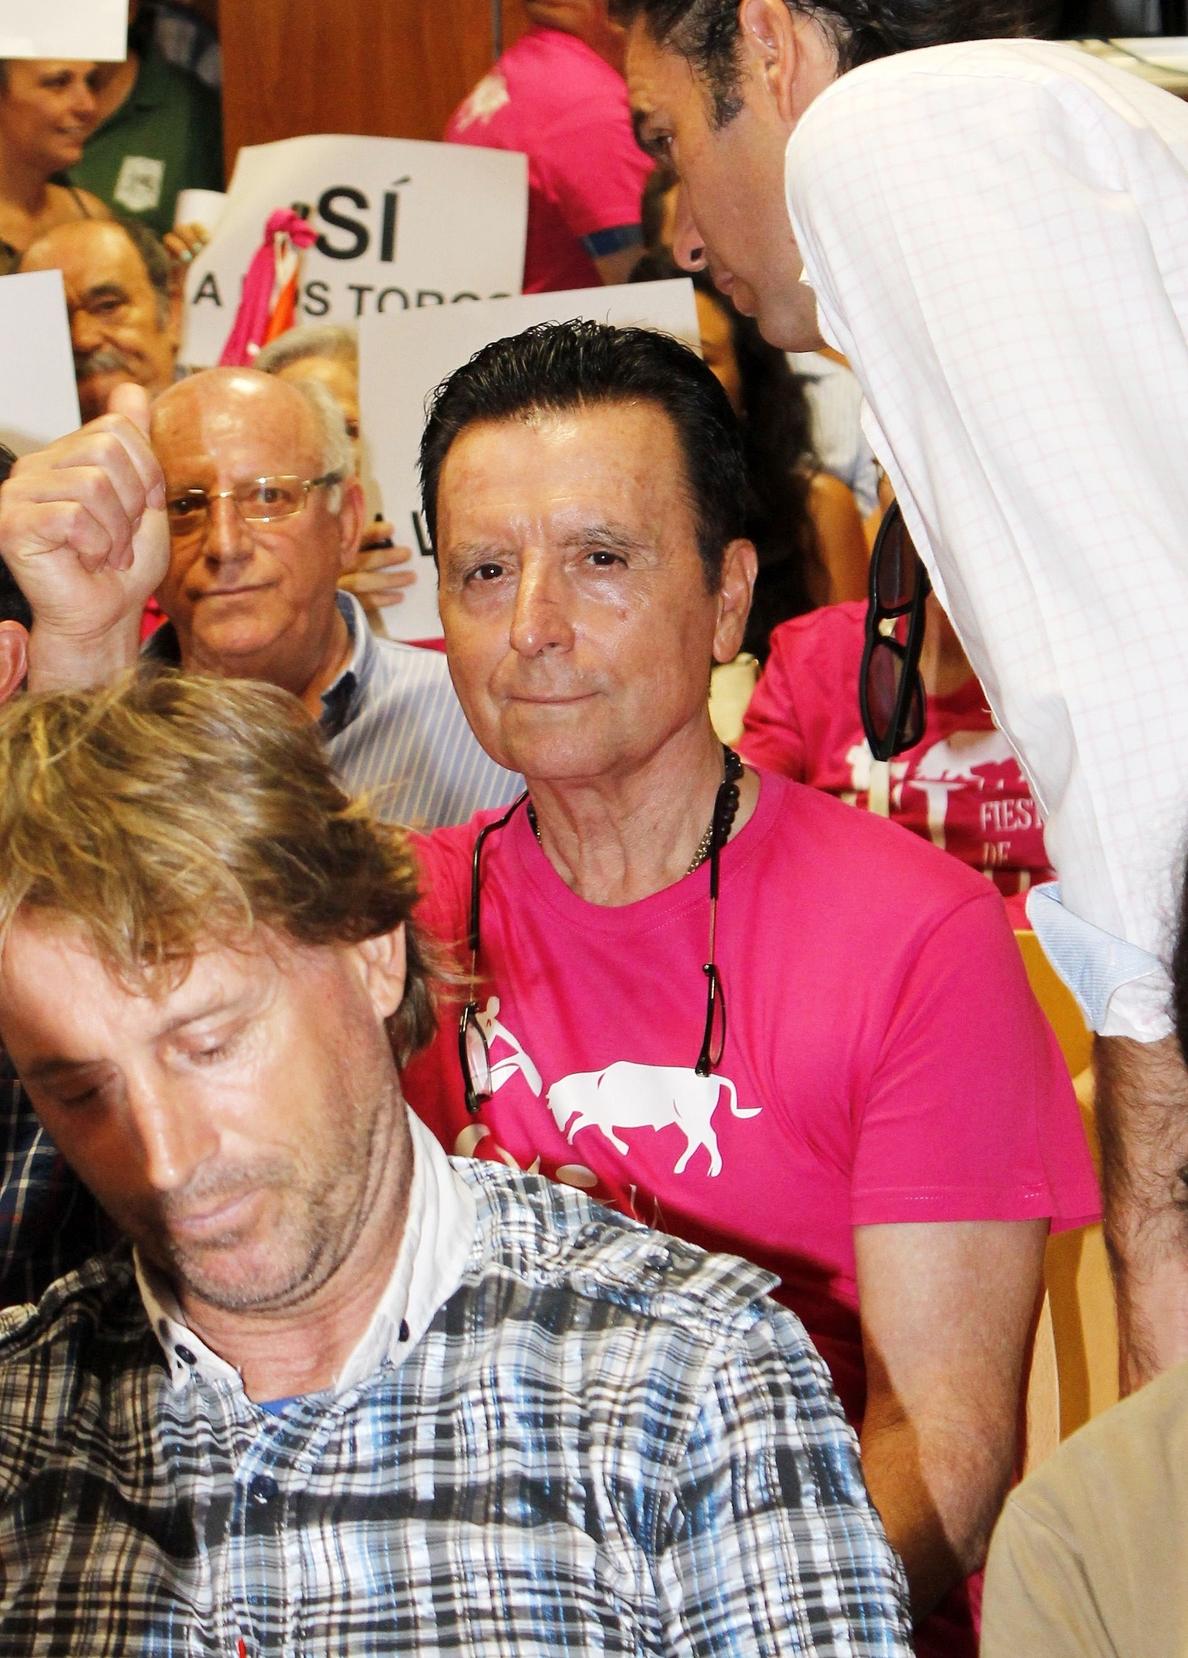 Aniceto, cuñado de Ortega Cano: «A José Fernando le veo fenomenal, estupendo»